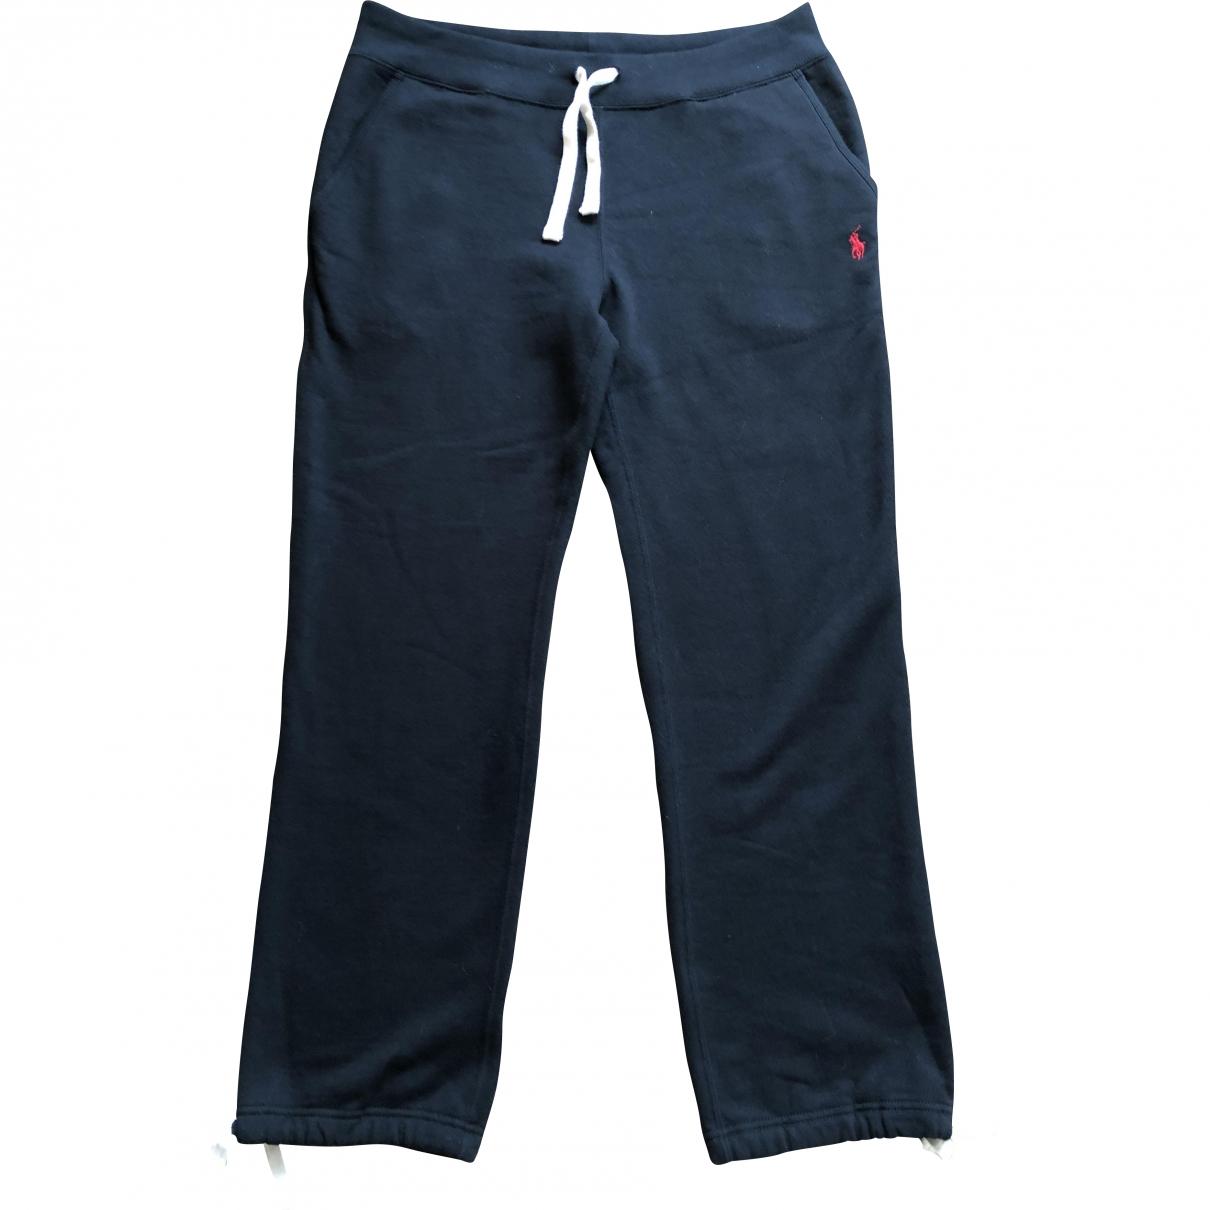 Polo Ralph Lauren \N Black Cotton Trousers for Men S International